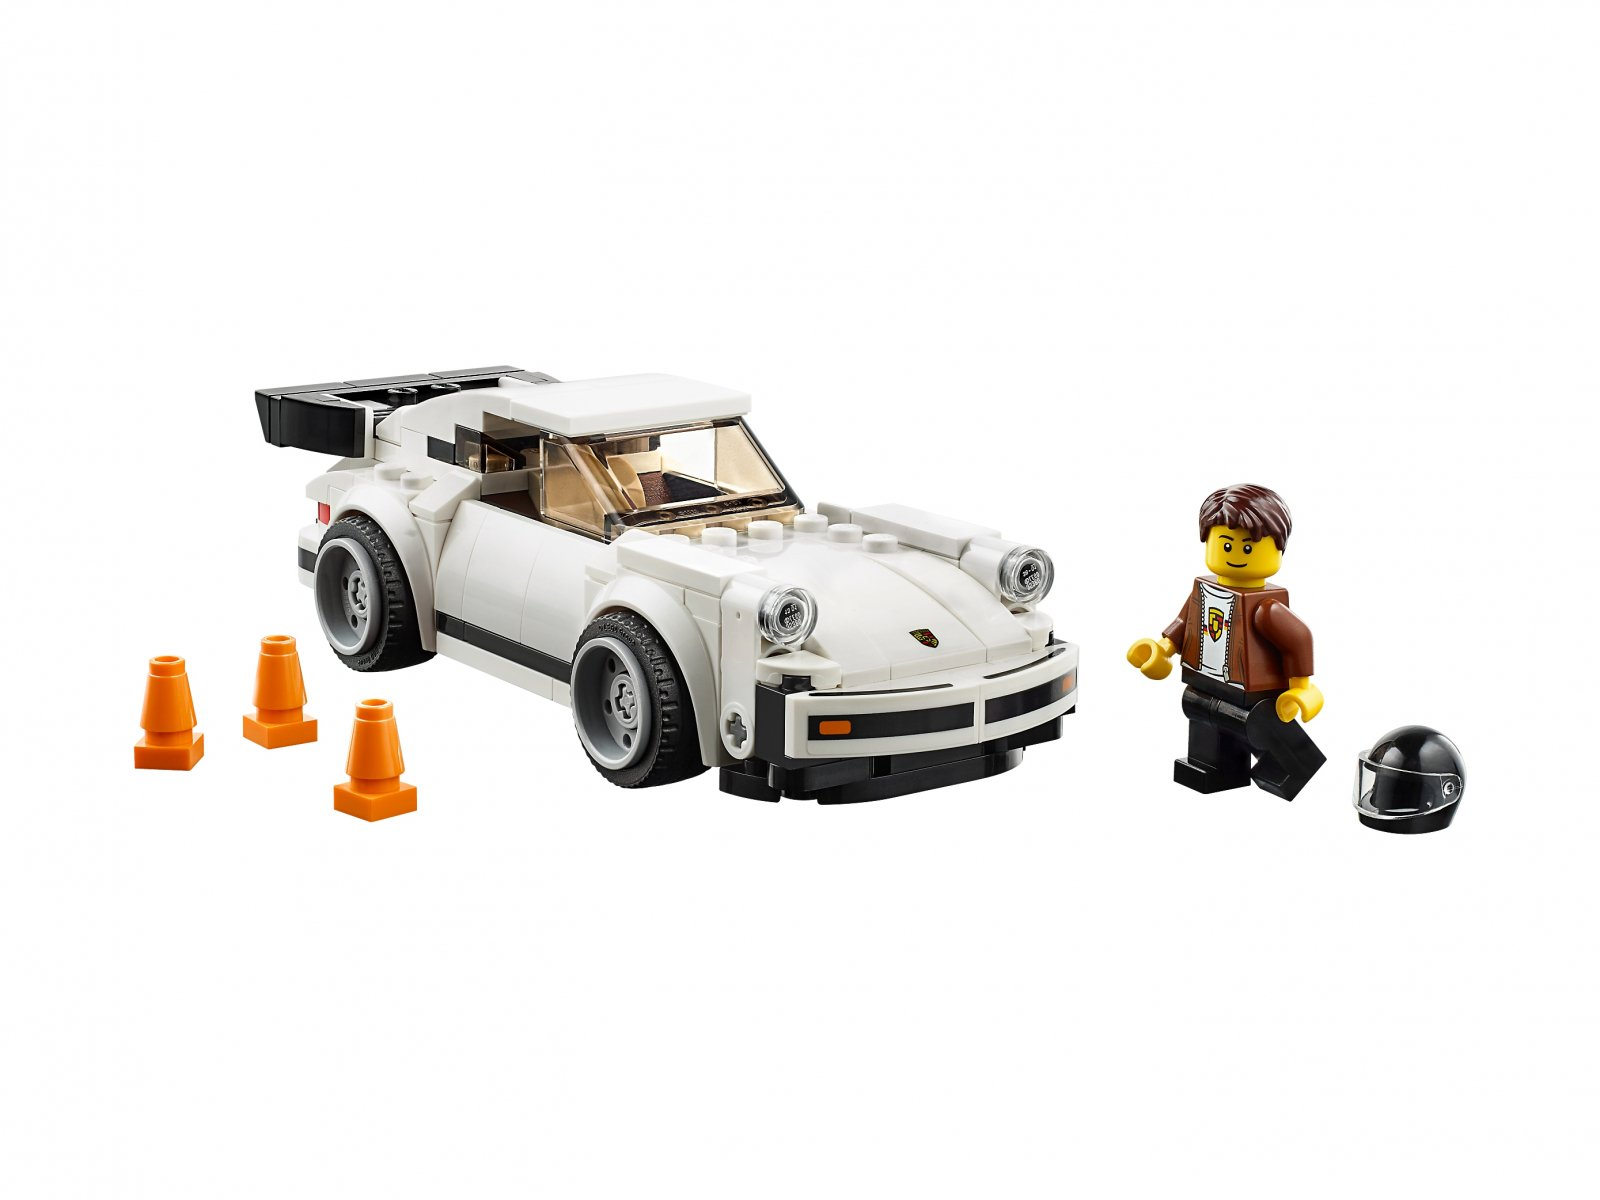 LEGO 75895 Speed Champions 1974 Porsche 911 Turbo 3.0